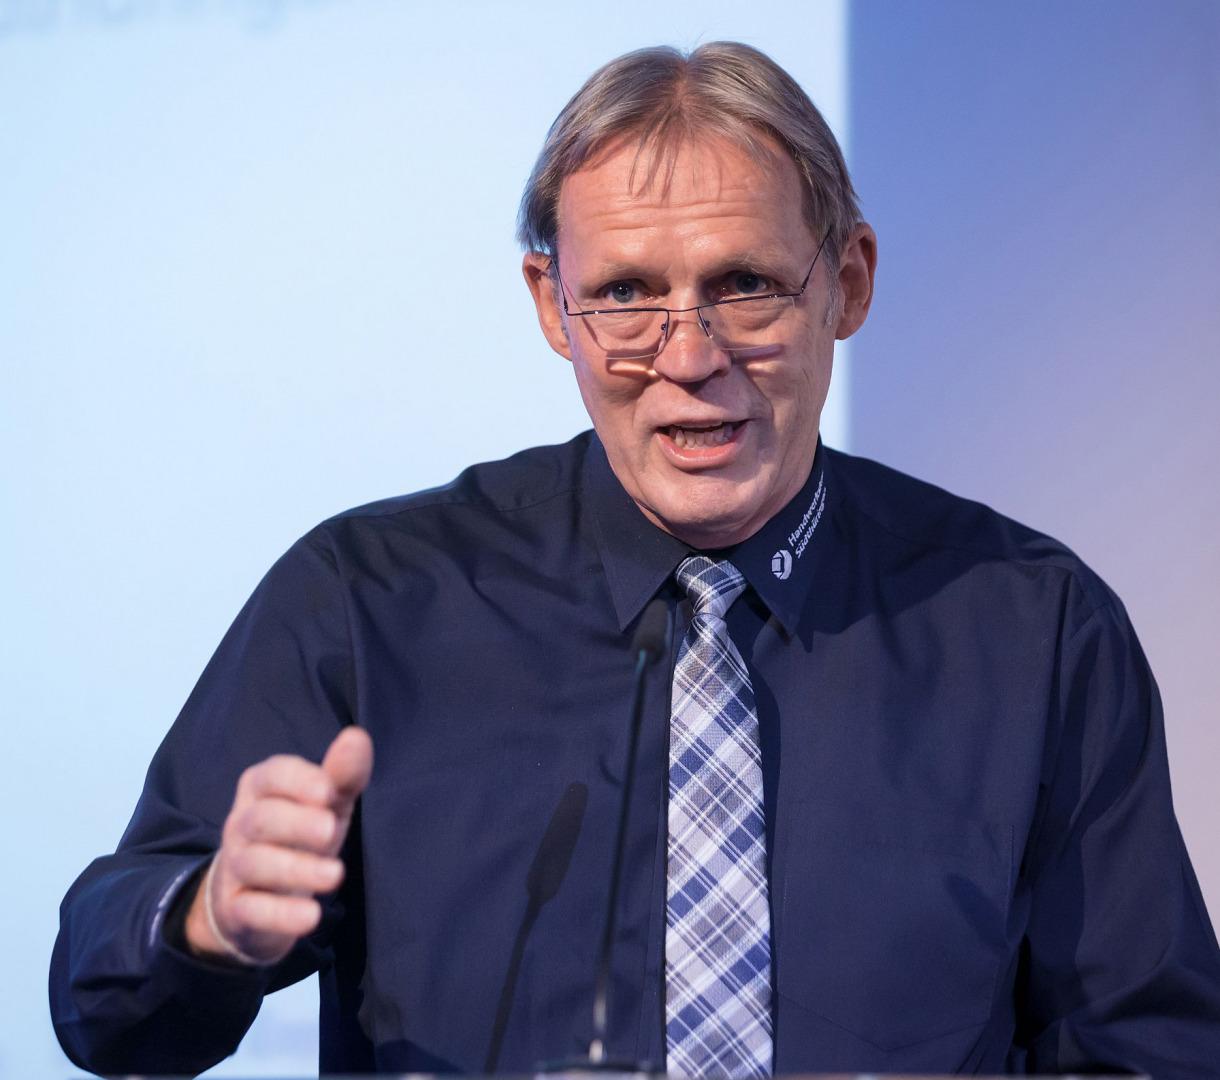 Manfred Scharfenberger